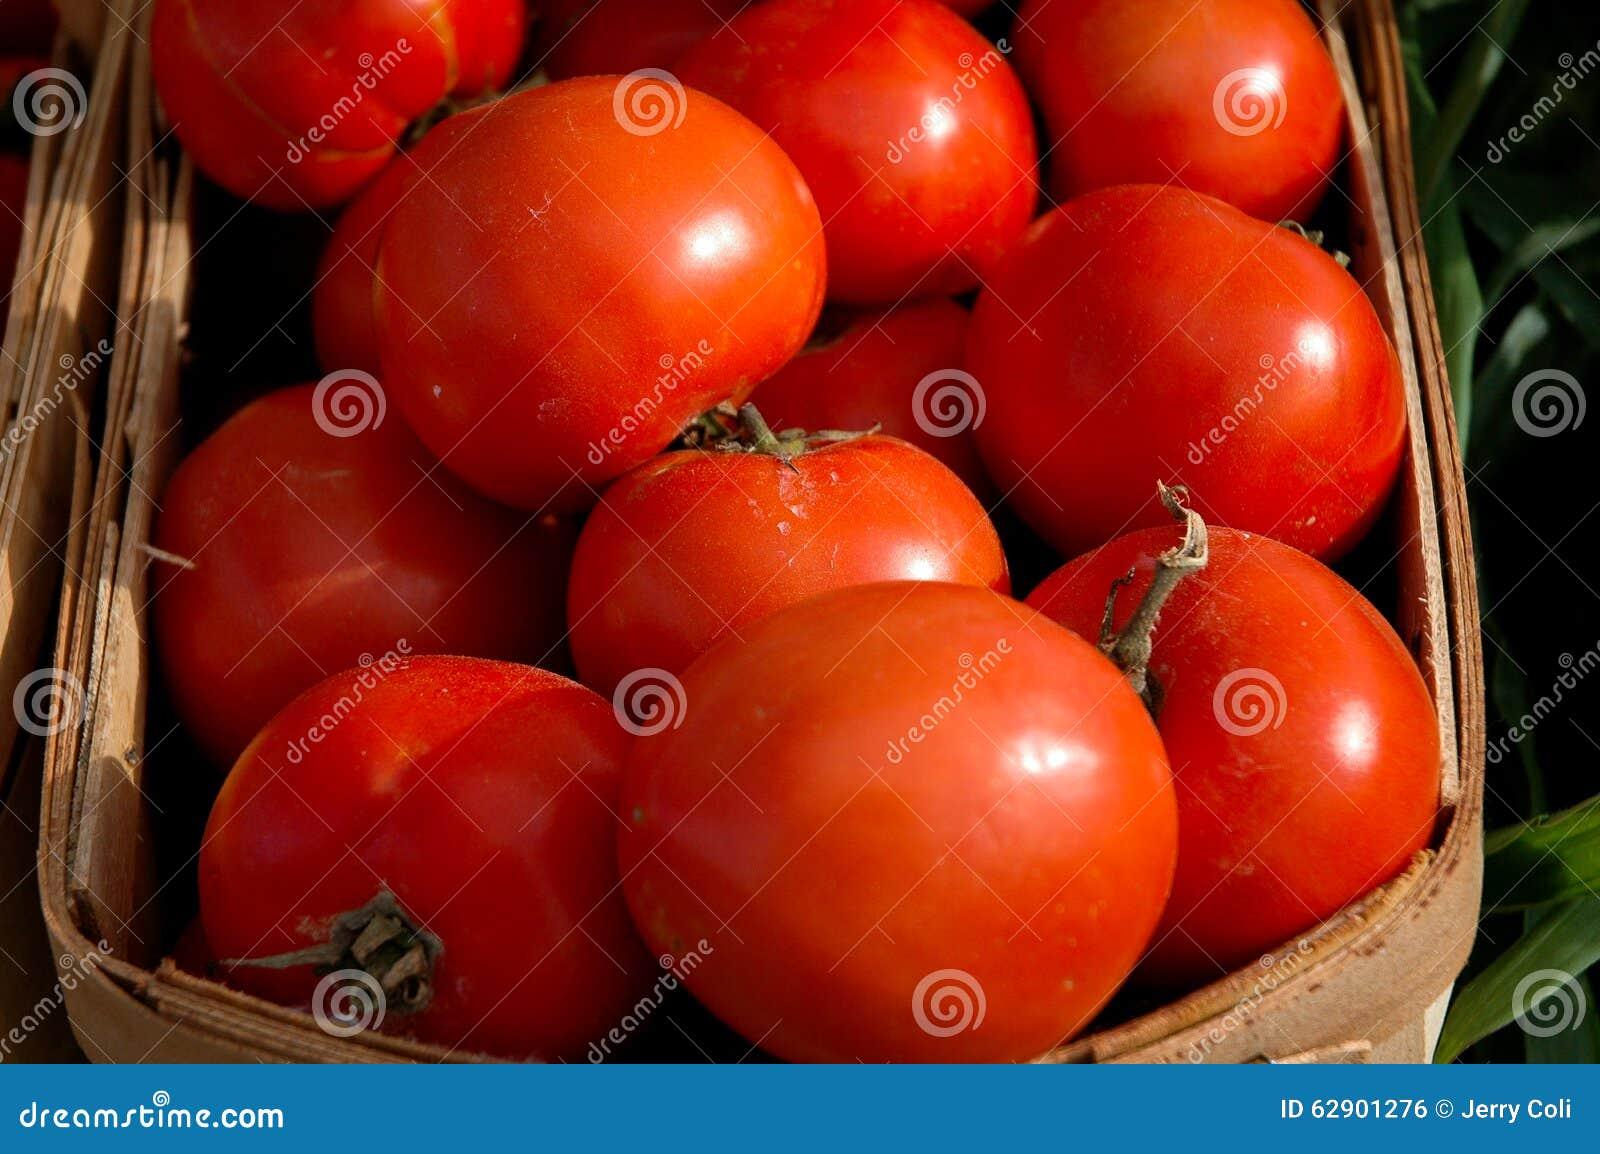 marketing strategies of tomato farmers Dairy farmers of america, inc (usa) danone  new marketing strategies in the offing  hagen-dazs develops tomato-cherry & carrot-orange flavours ice creams.